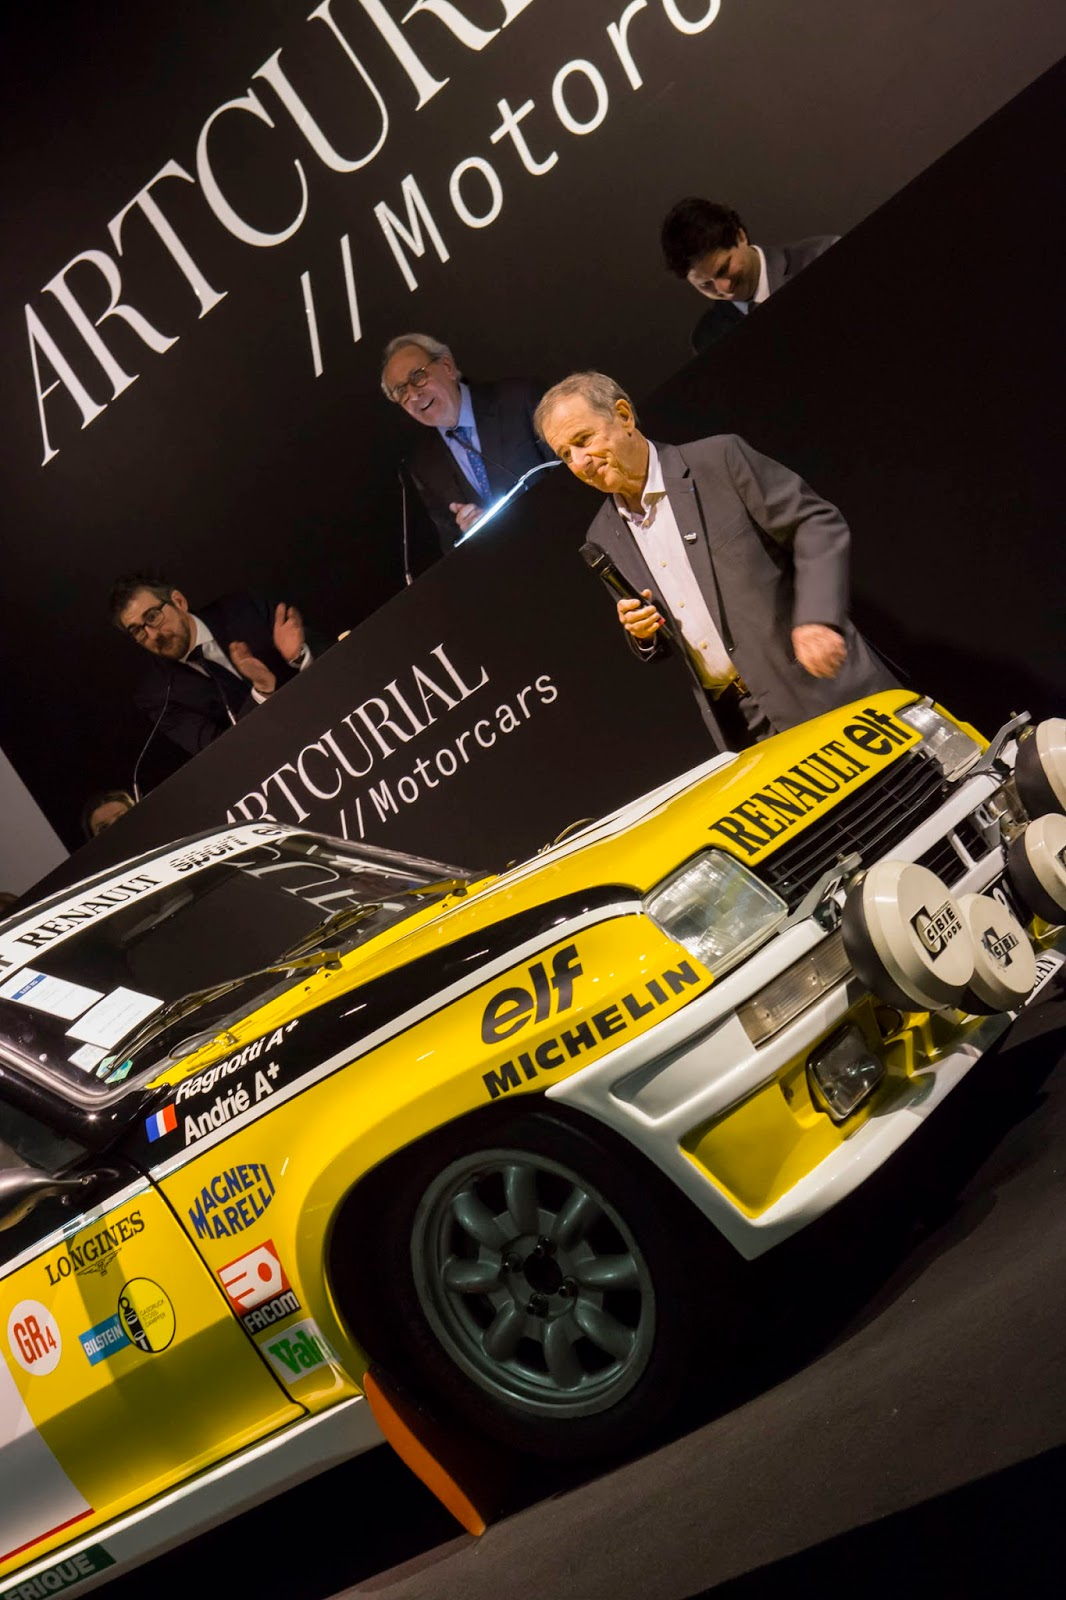 Lot+95_2+1982+Renault+5+Turbo+Groupe+4+%C2%A9Artcurial+copy